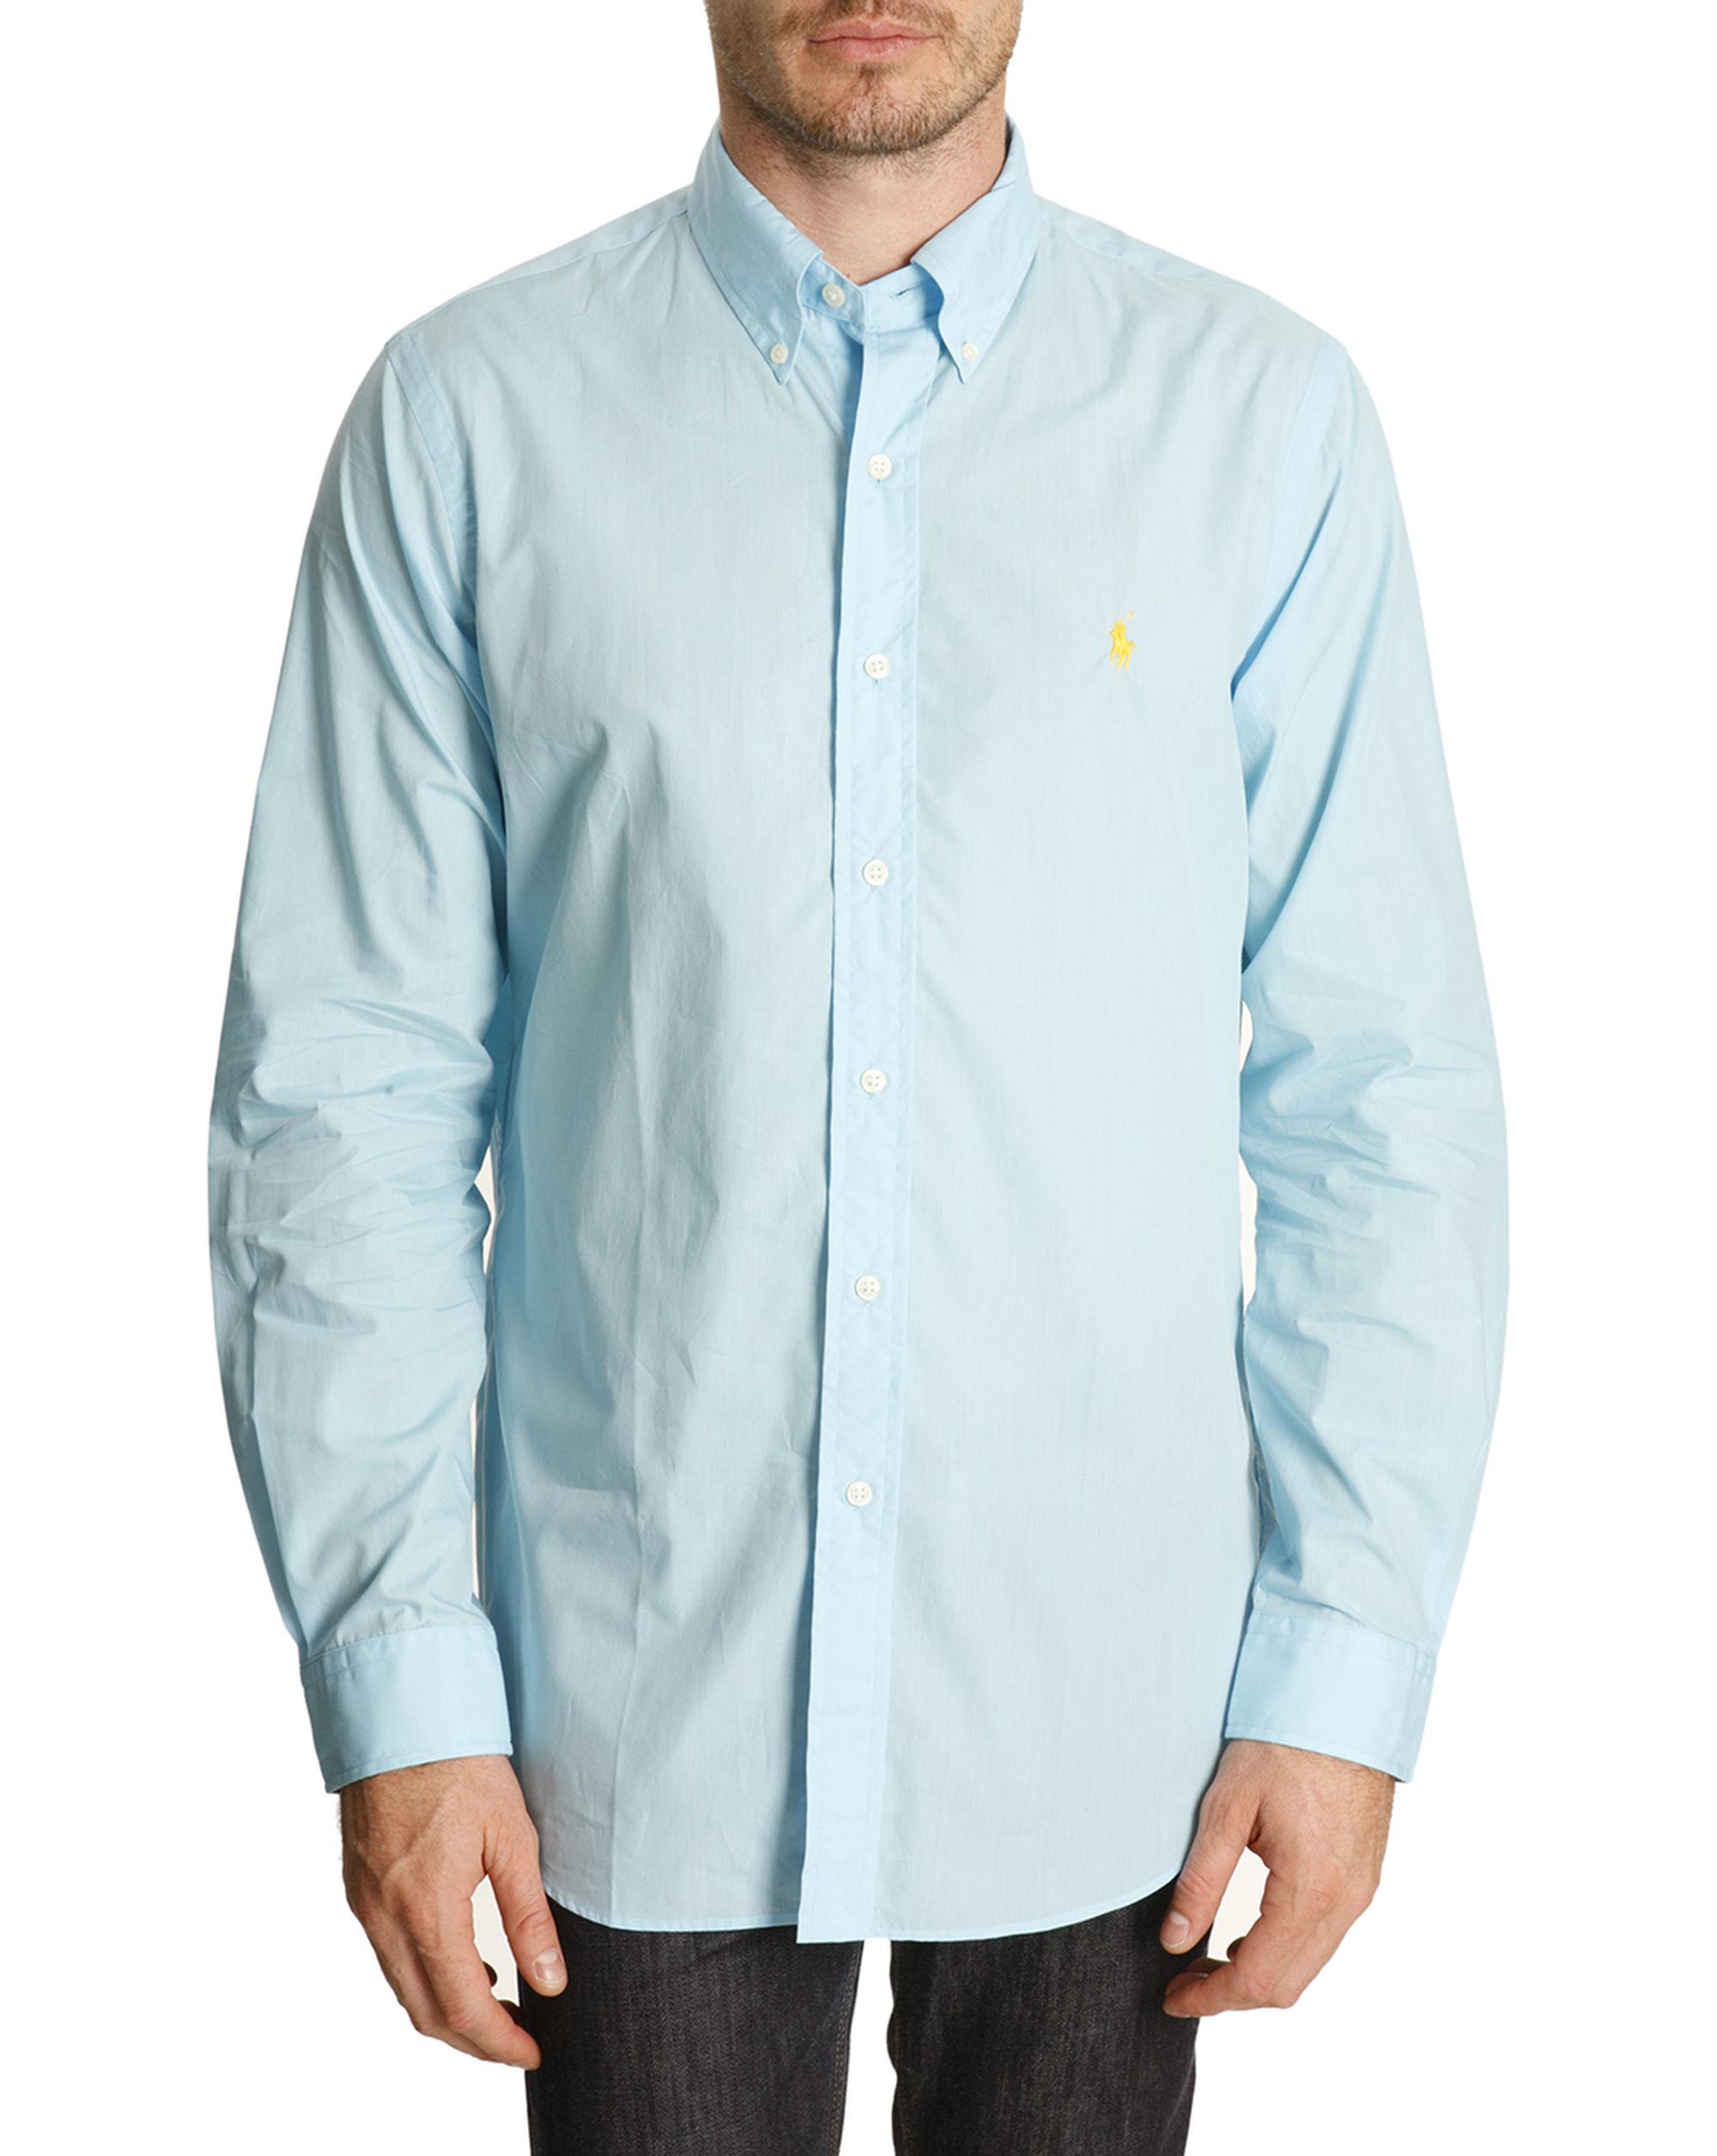 Polo ralph lauren turquoise blue color poplin slim shirt for Aqua blue mens dress shirt